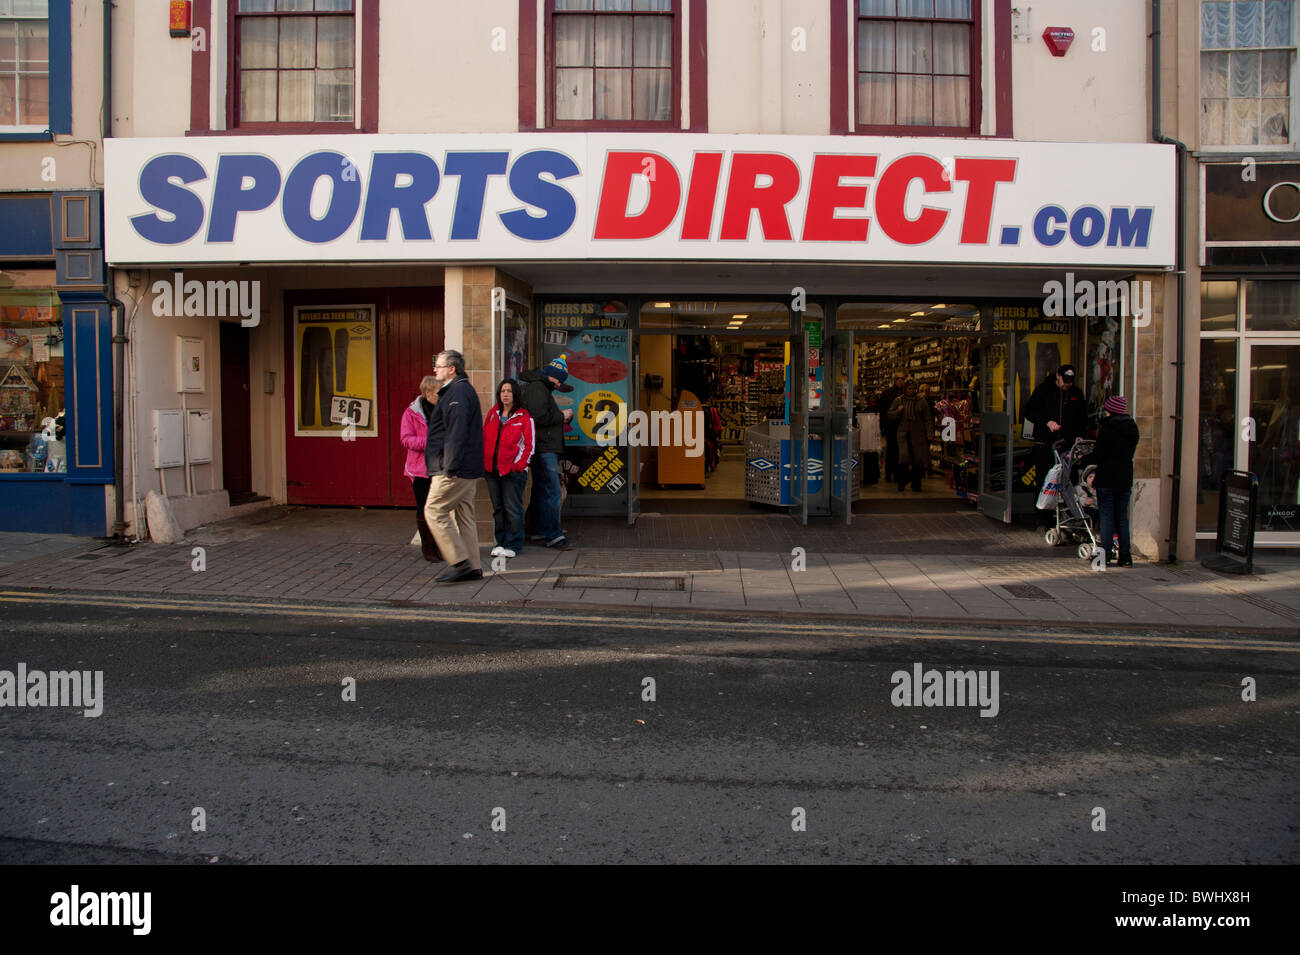 Sports Direct.com sportswear store shop UK - Stock Image